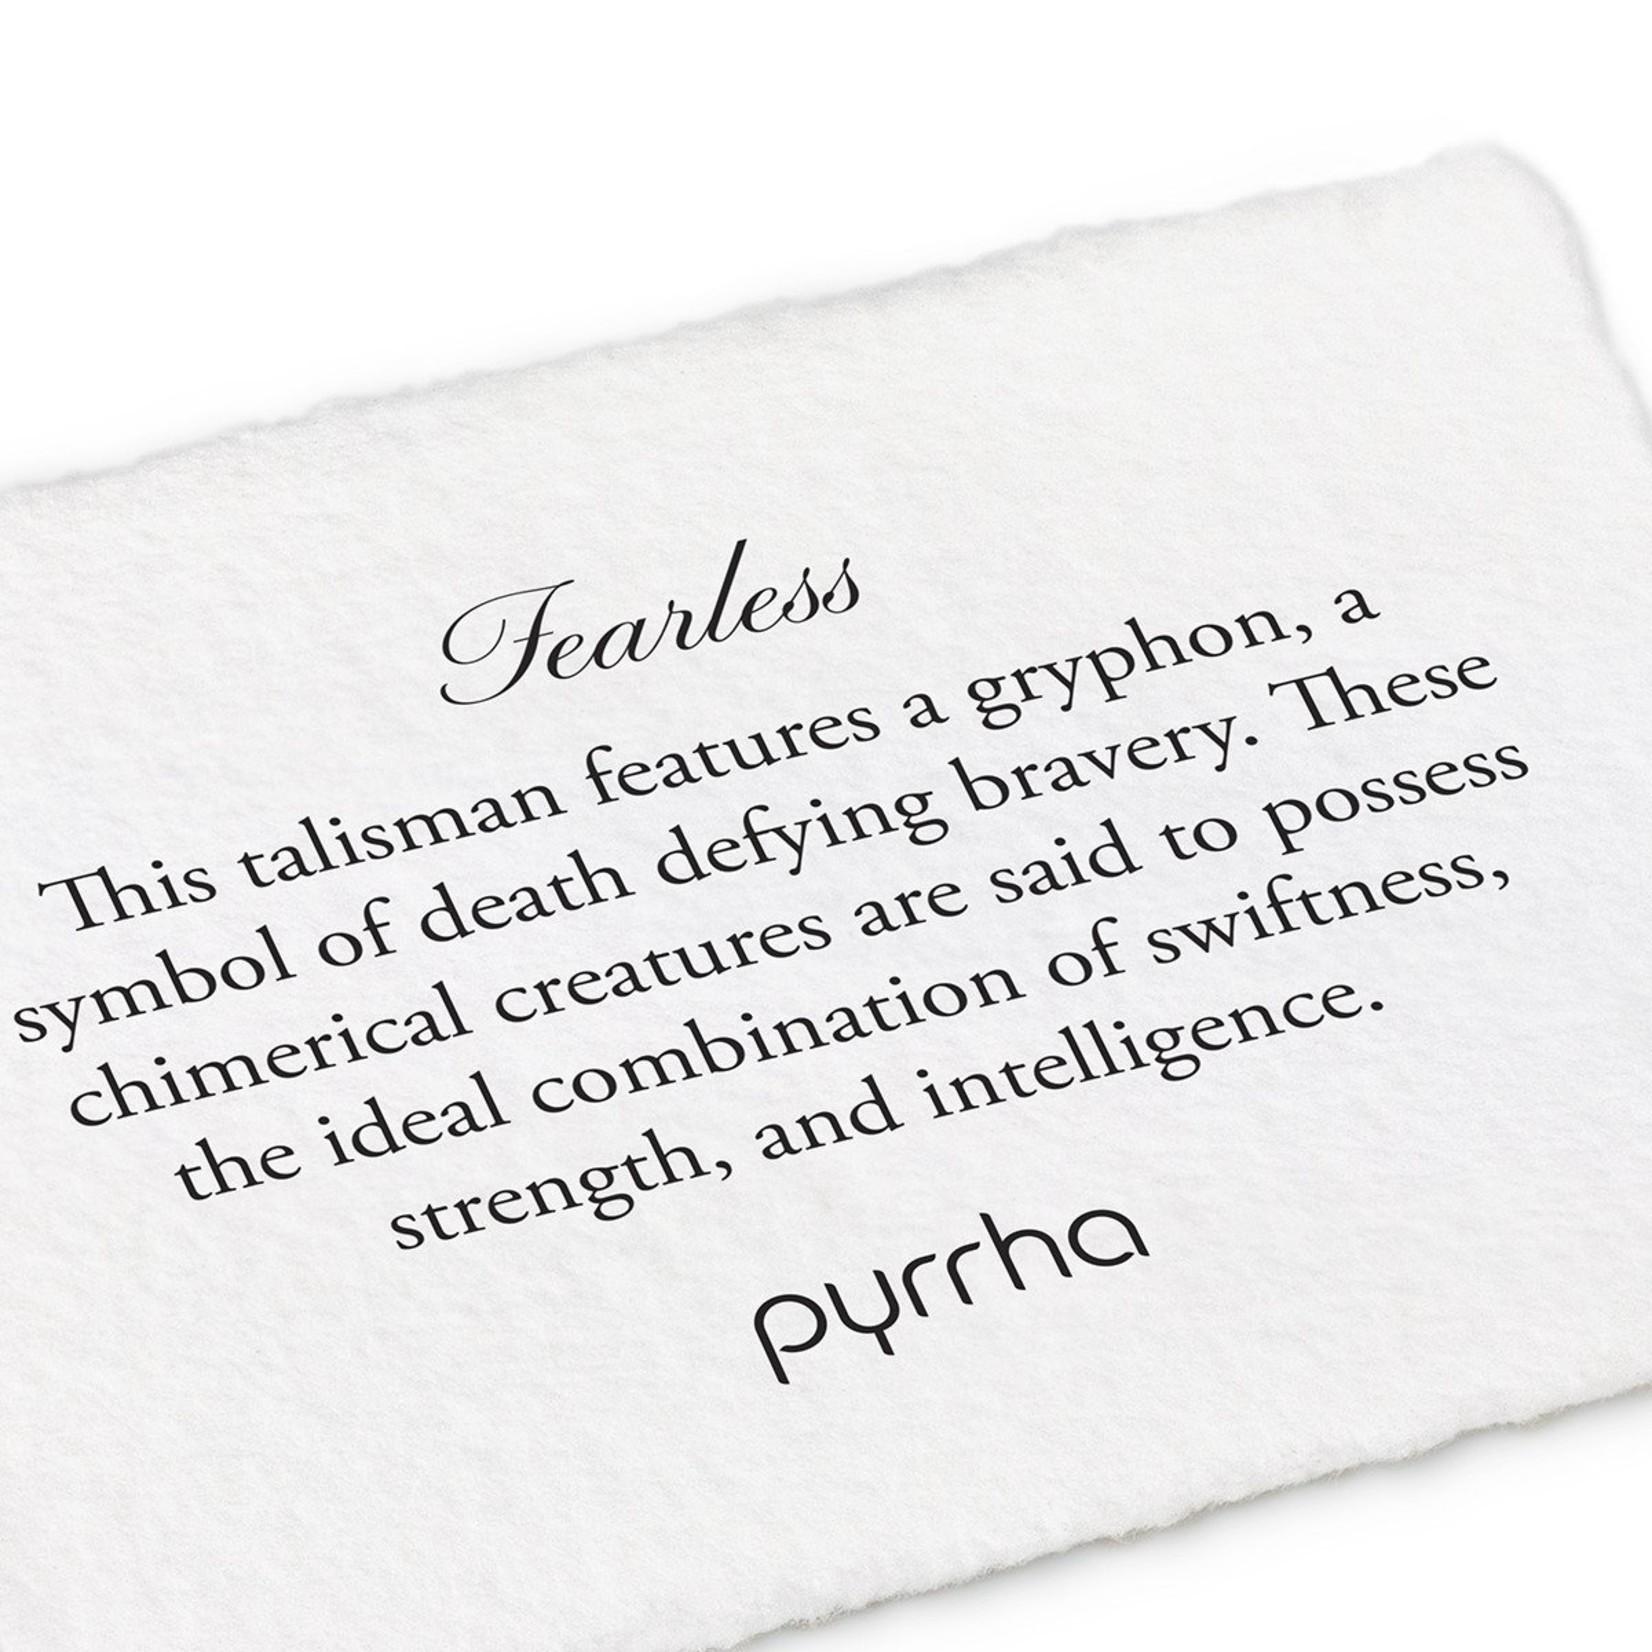 Pyrrha Fearless Signature Talisman